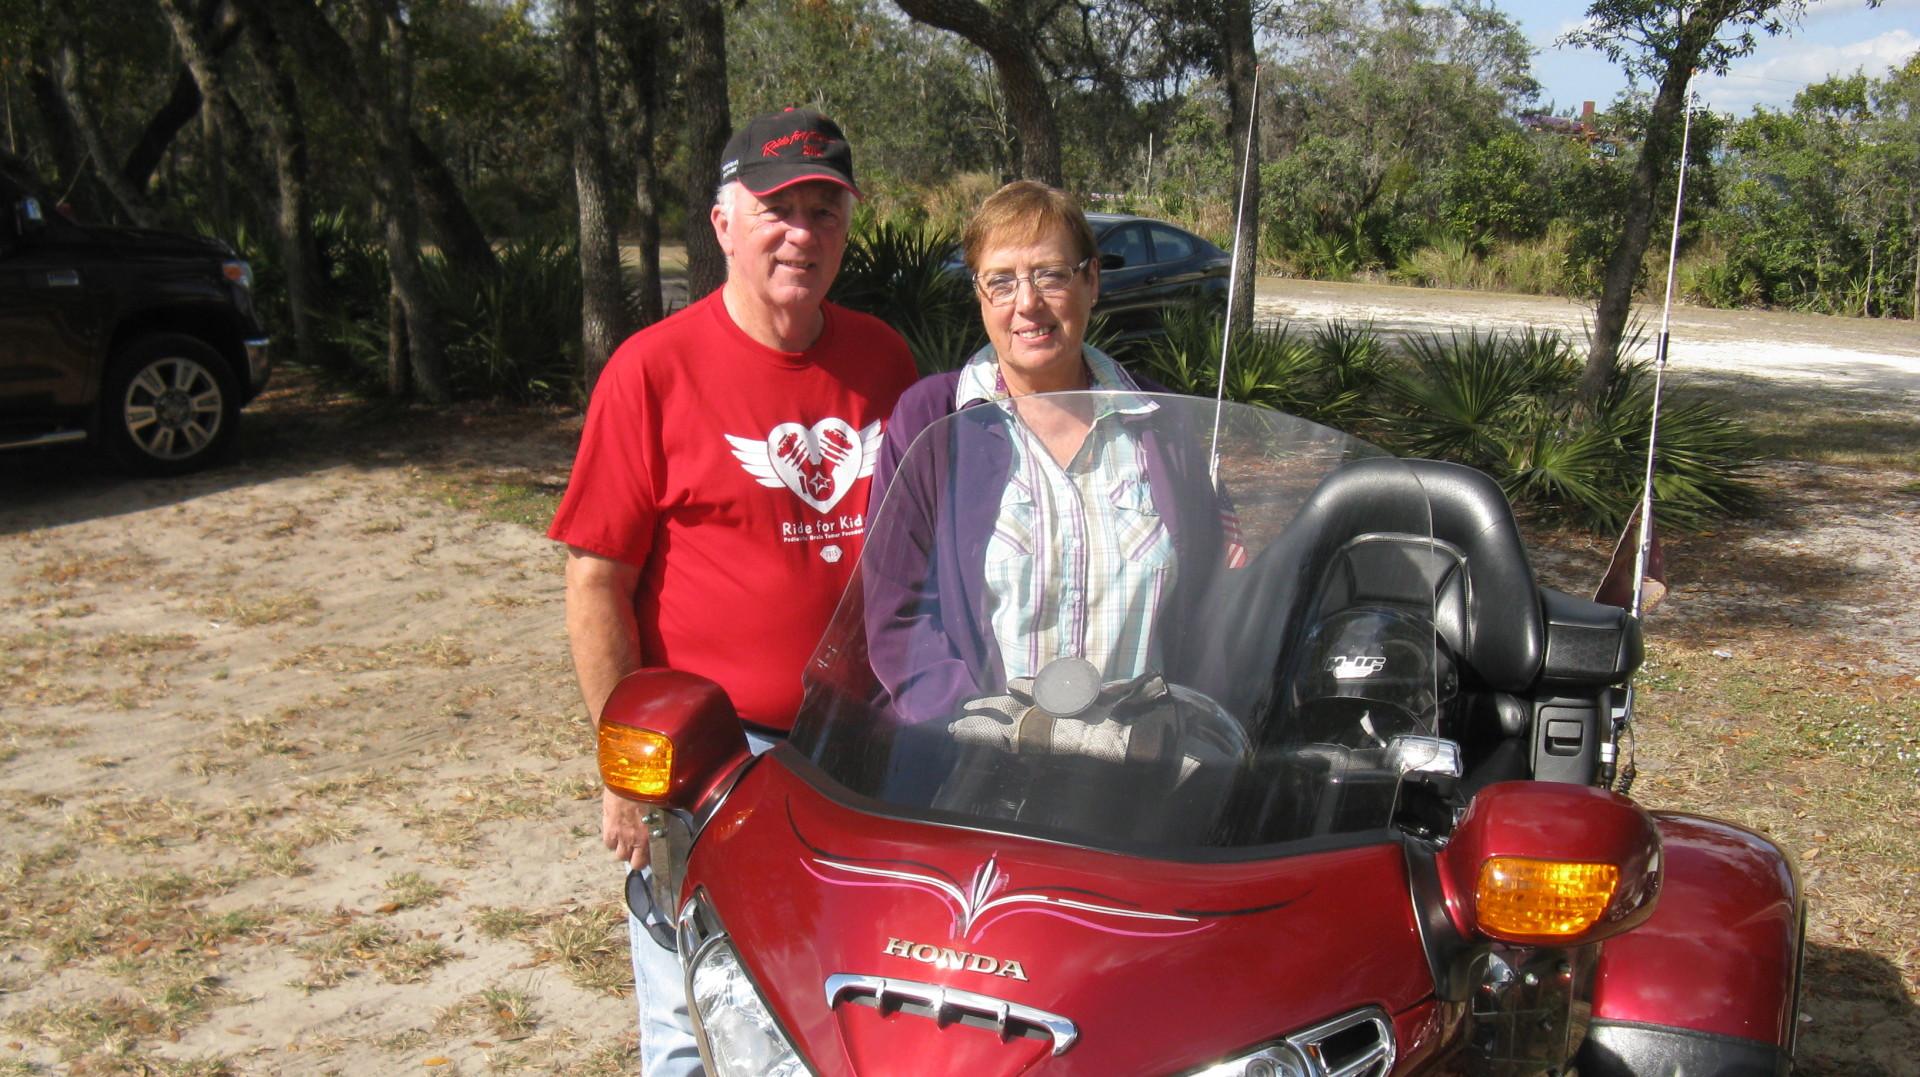 Ken and Donna Granger